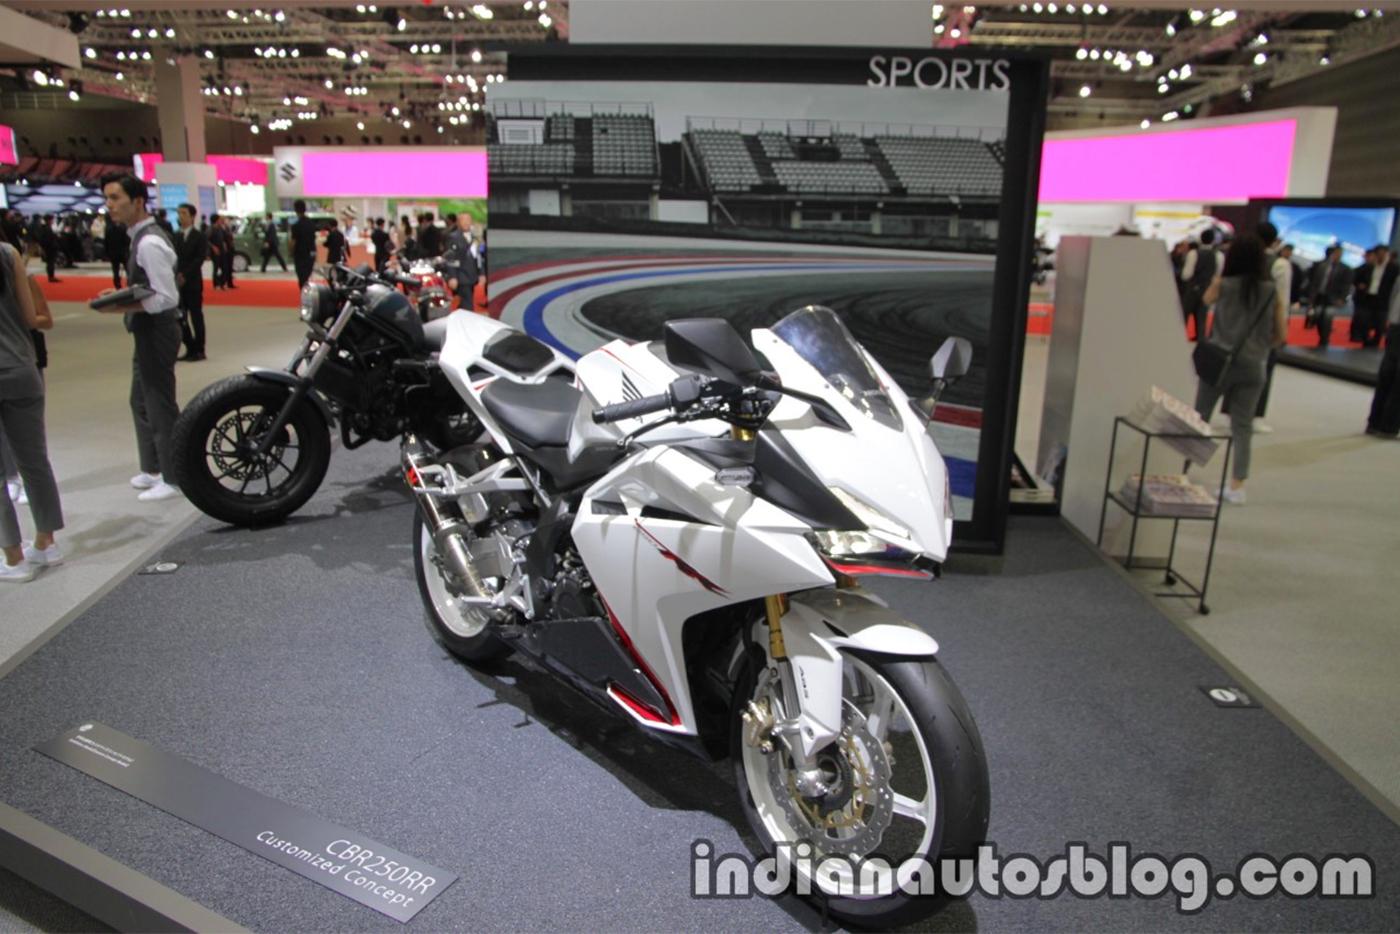 honda-cbr-250rr-pearl-glare-white-3.jpg